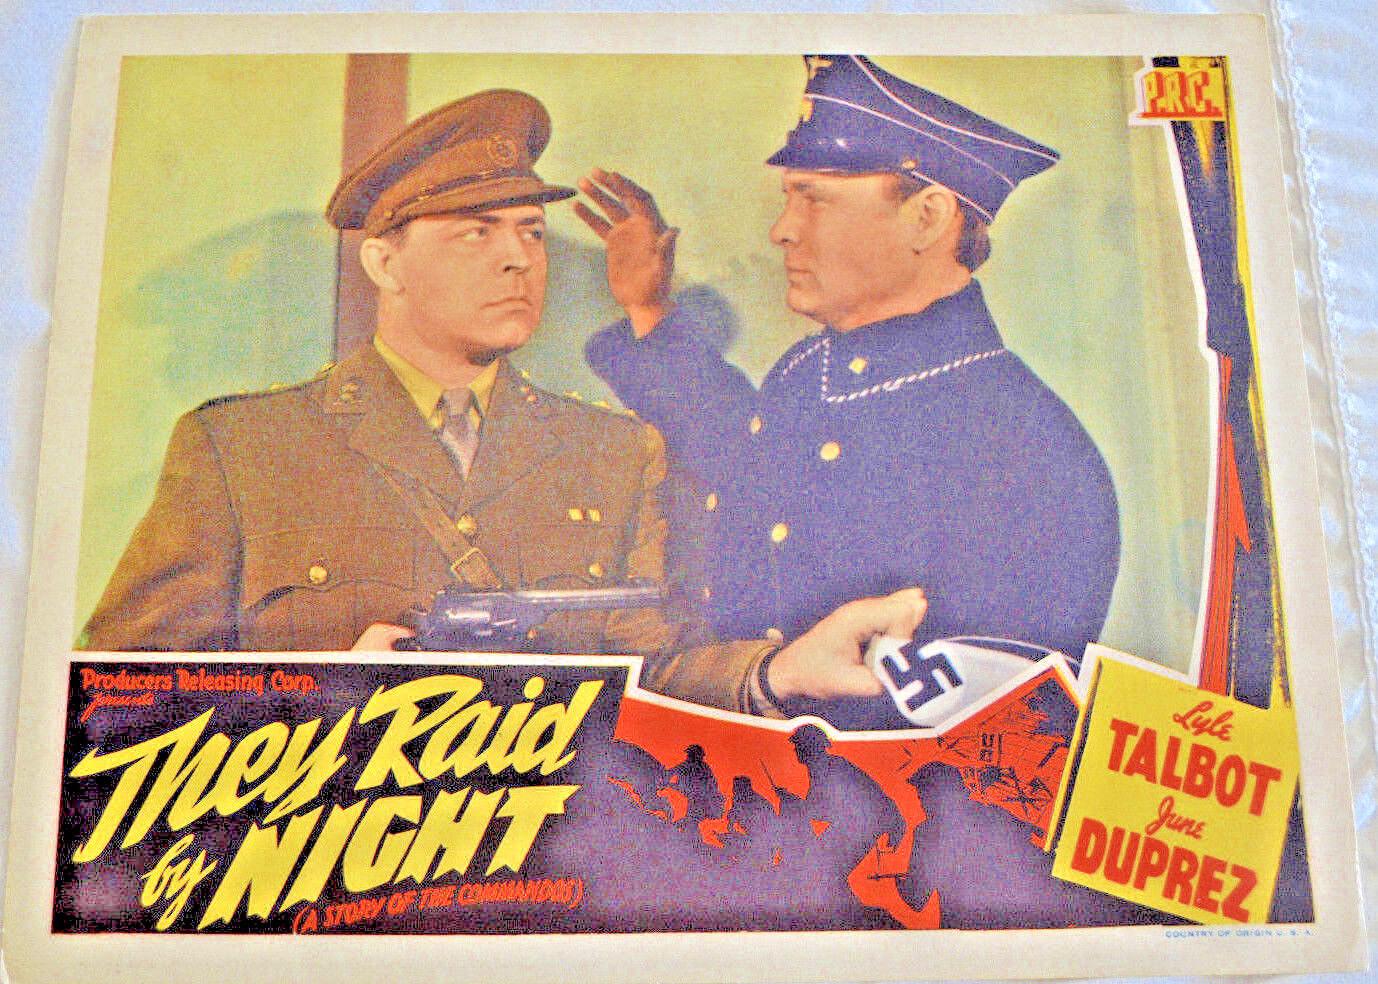 Lyle Talbot, They Raid By Night 1942 Lobby Card - Very Good To Near Mint, PRC - $25.00